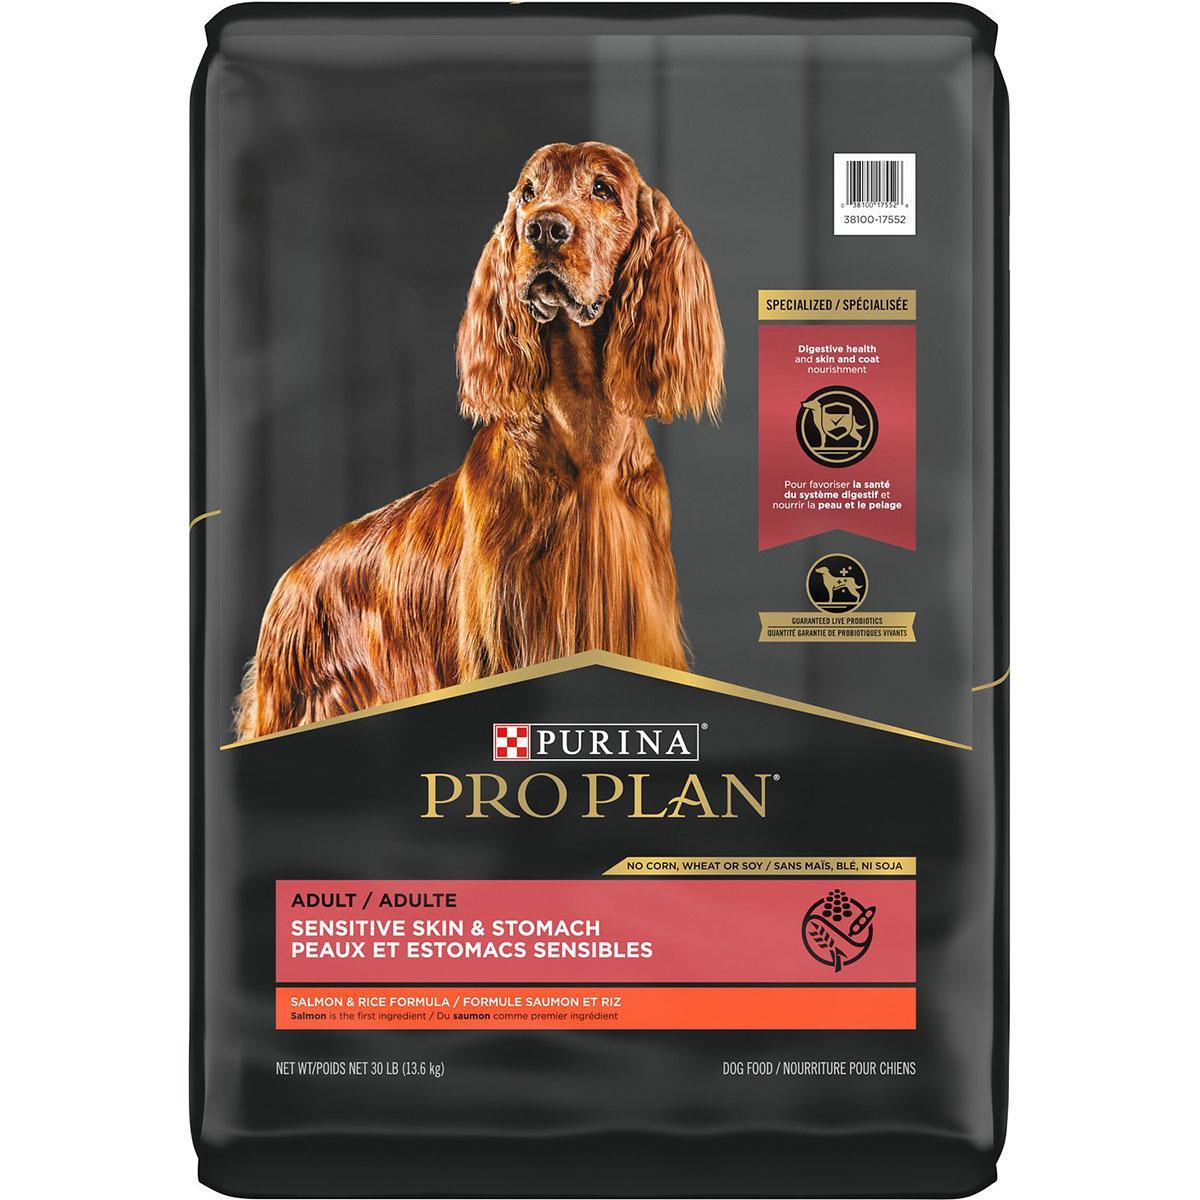 Purina Pro Plan Adult Sensitive Skin & Stomach Dry Dog Food - Salmon & Rice